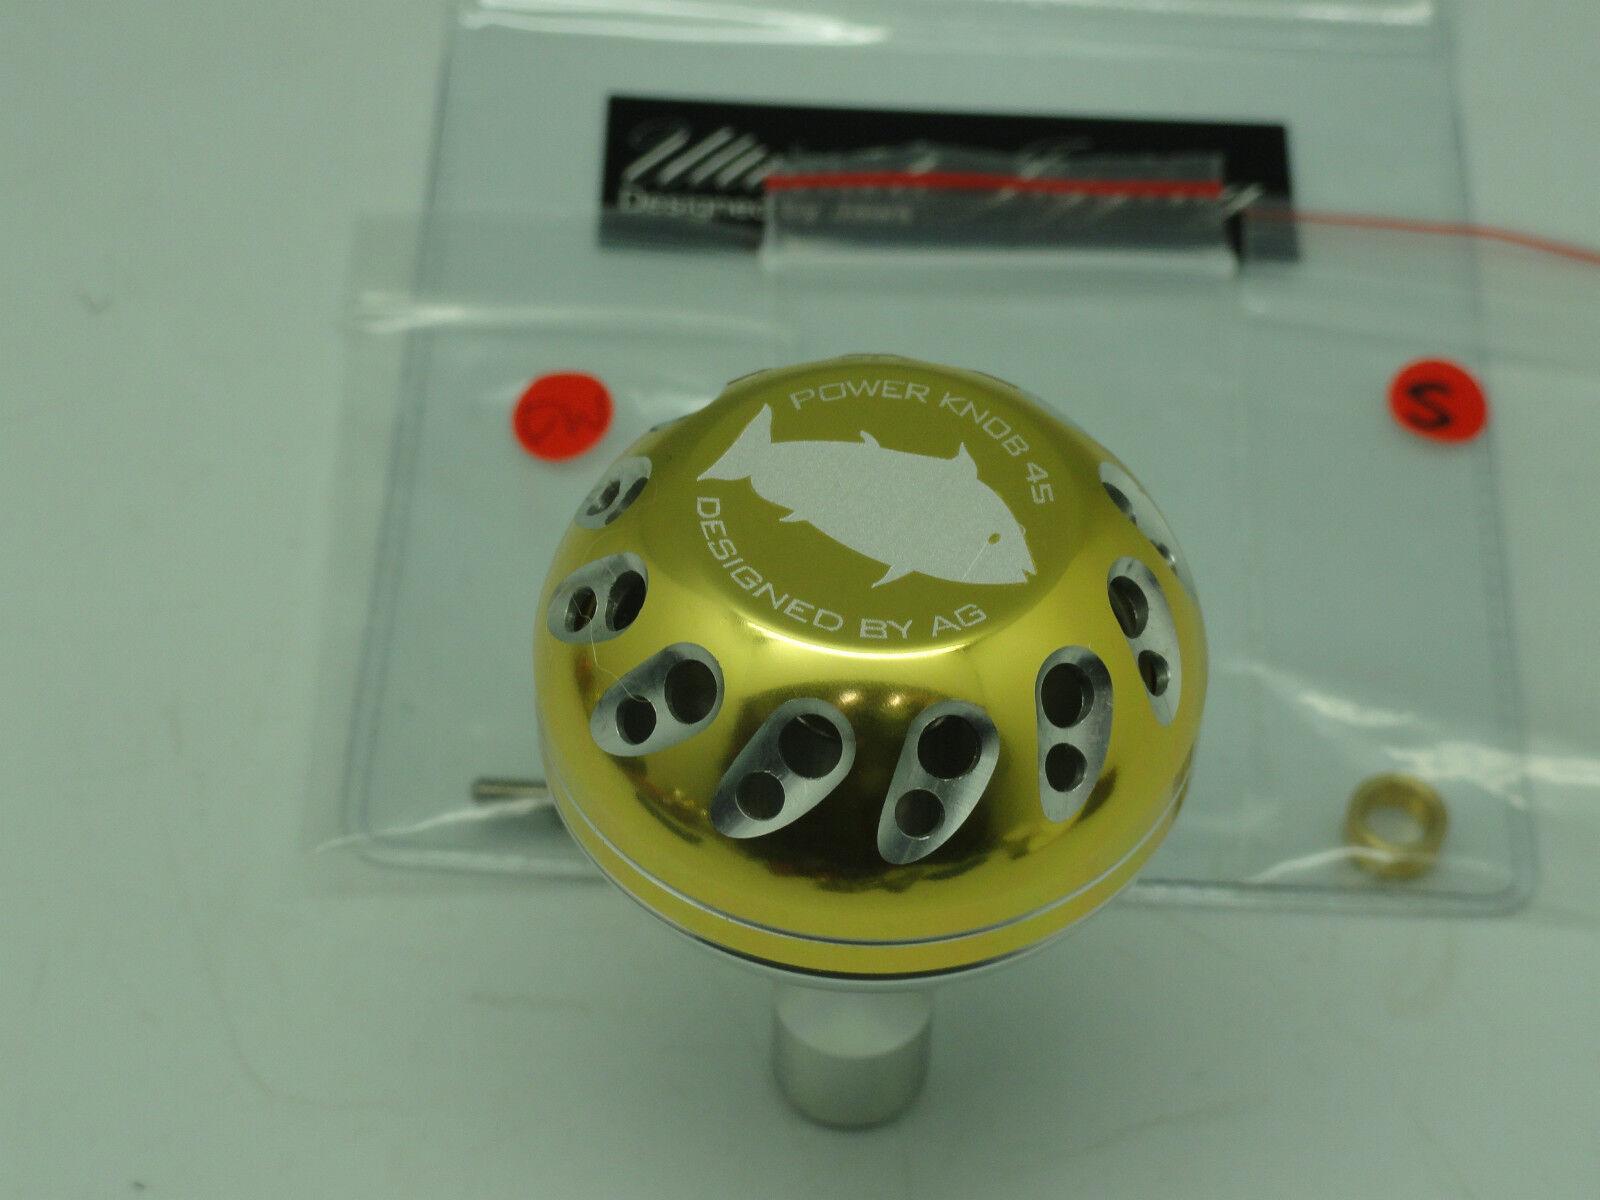 PRK 45 knob for Daiwa Saltiga  Tanacom Bull Shimano Ocea Jigger Talica reel PG SV  discount sale